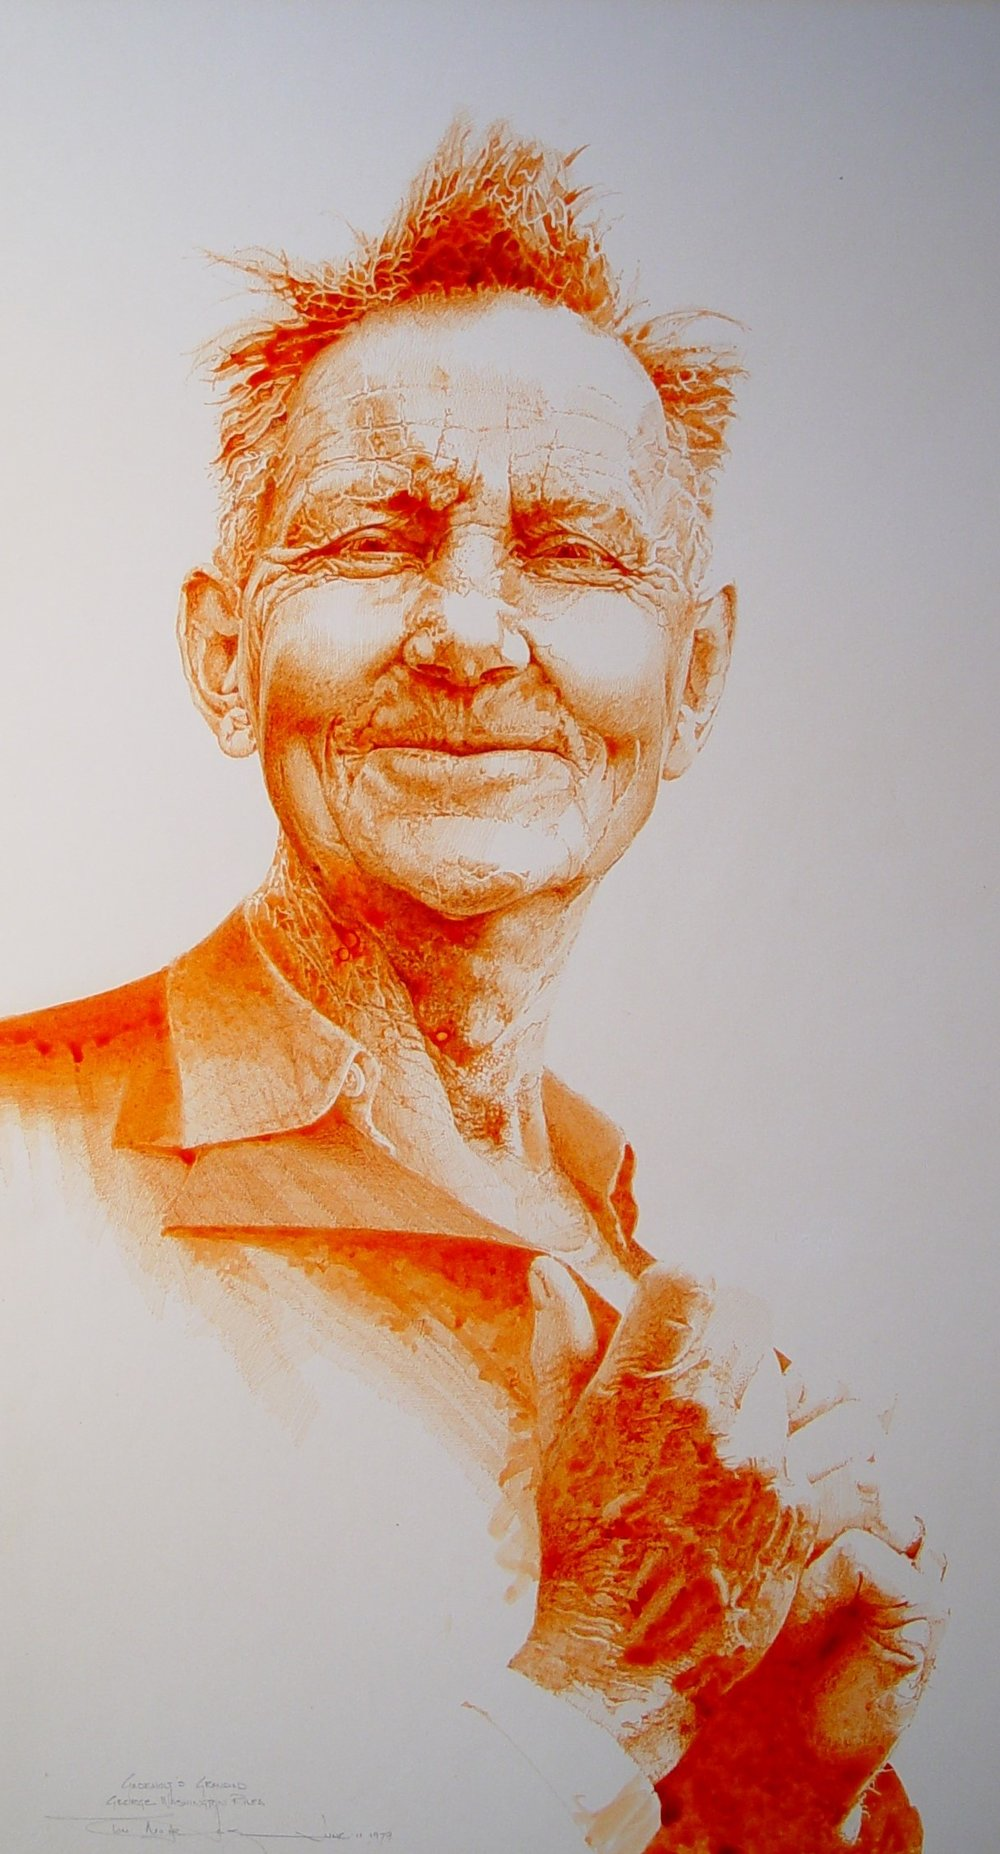 Draw 1. Gadeholts Grandad_Pen and ink_00_23x12.5.jpg